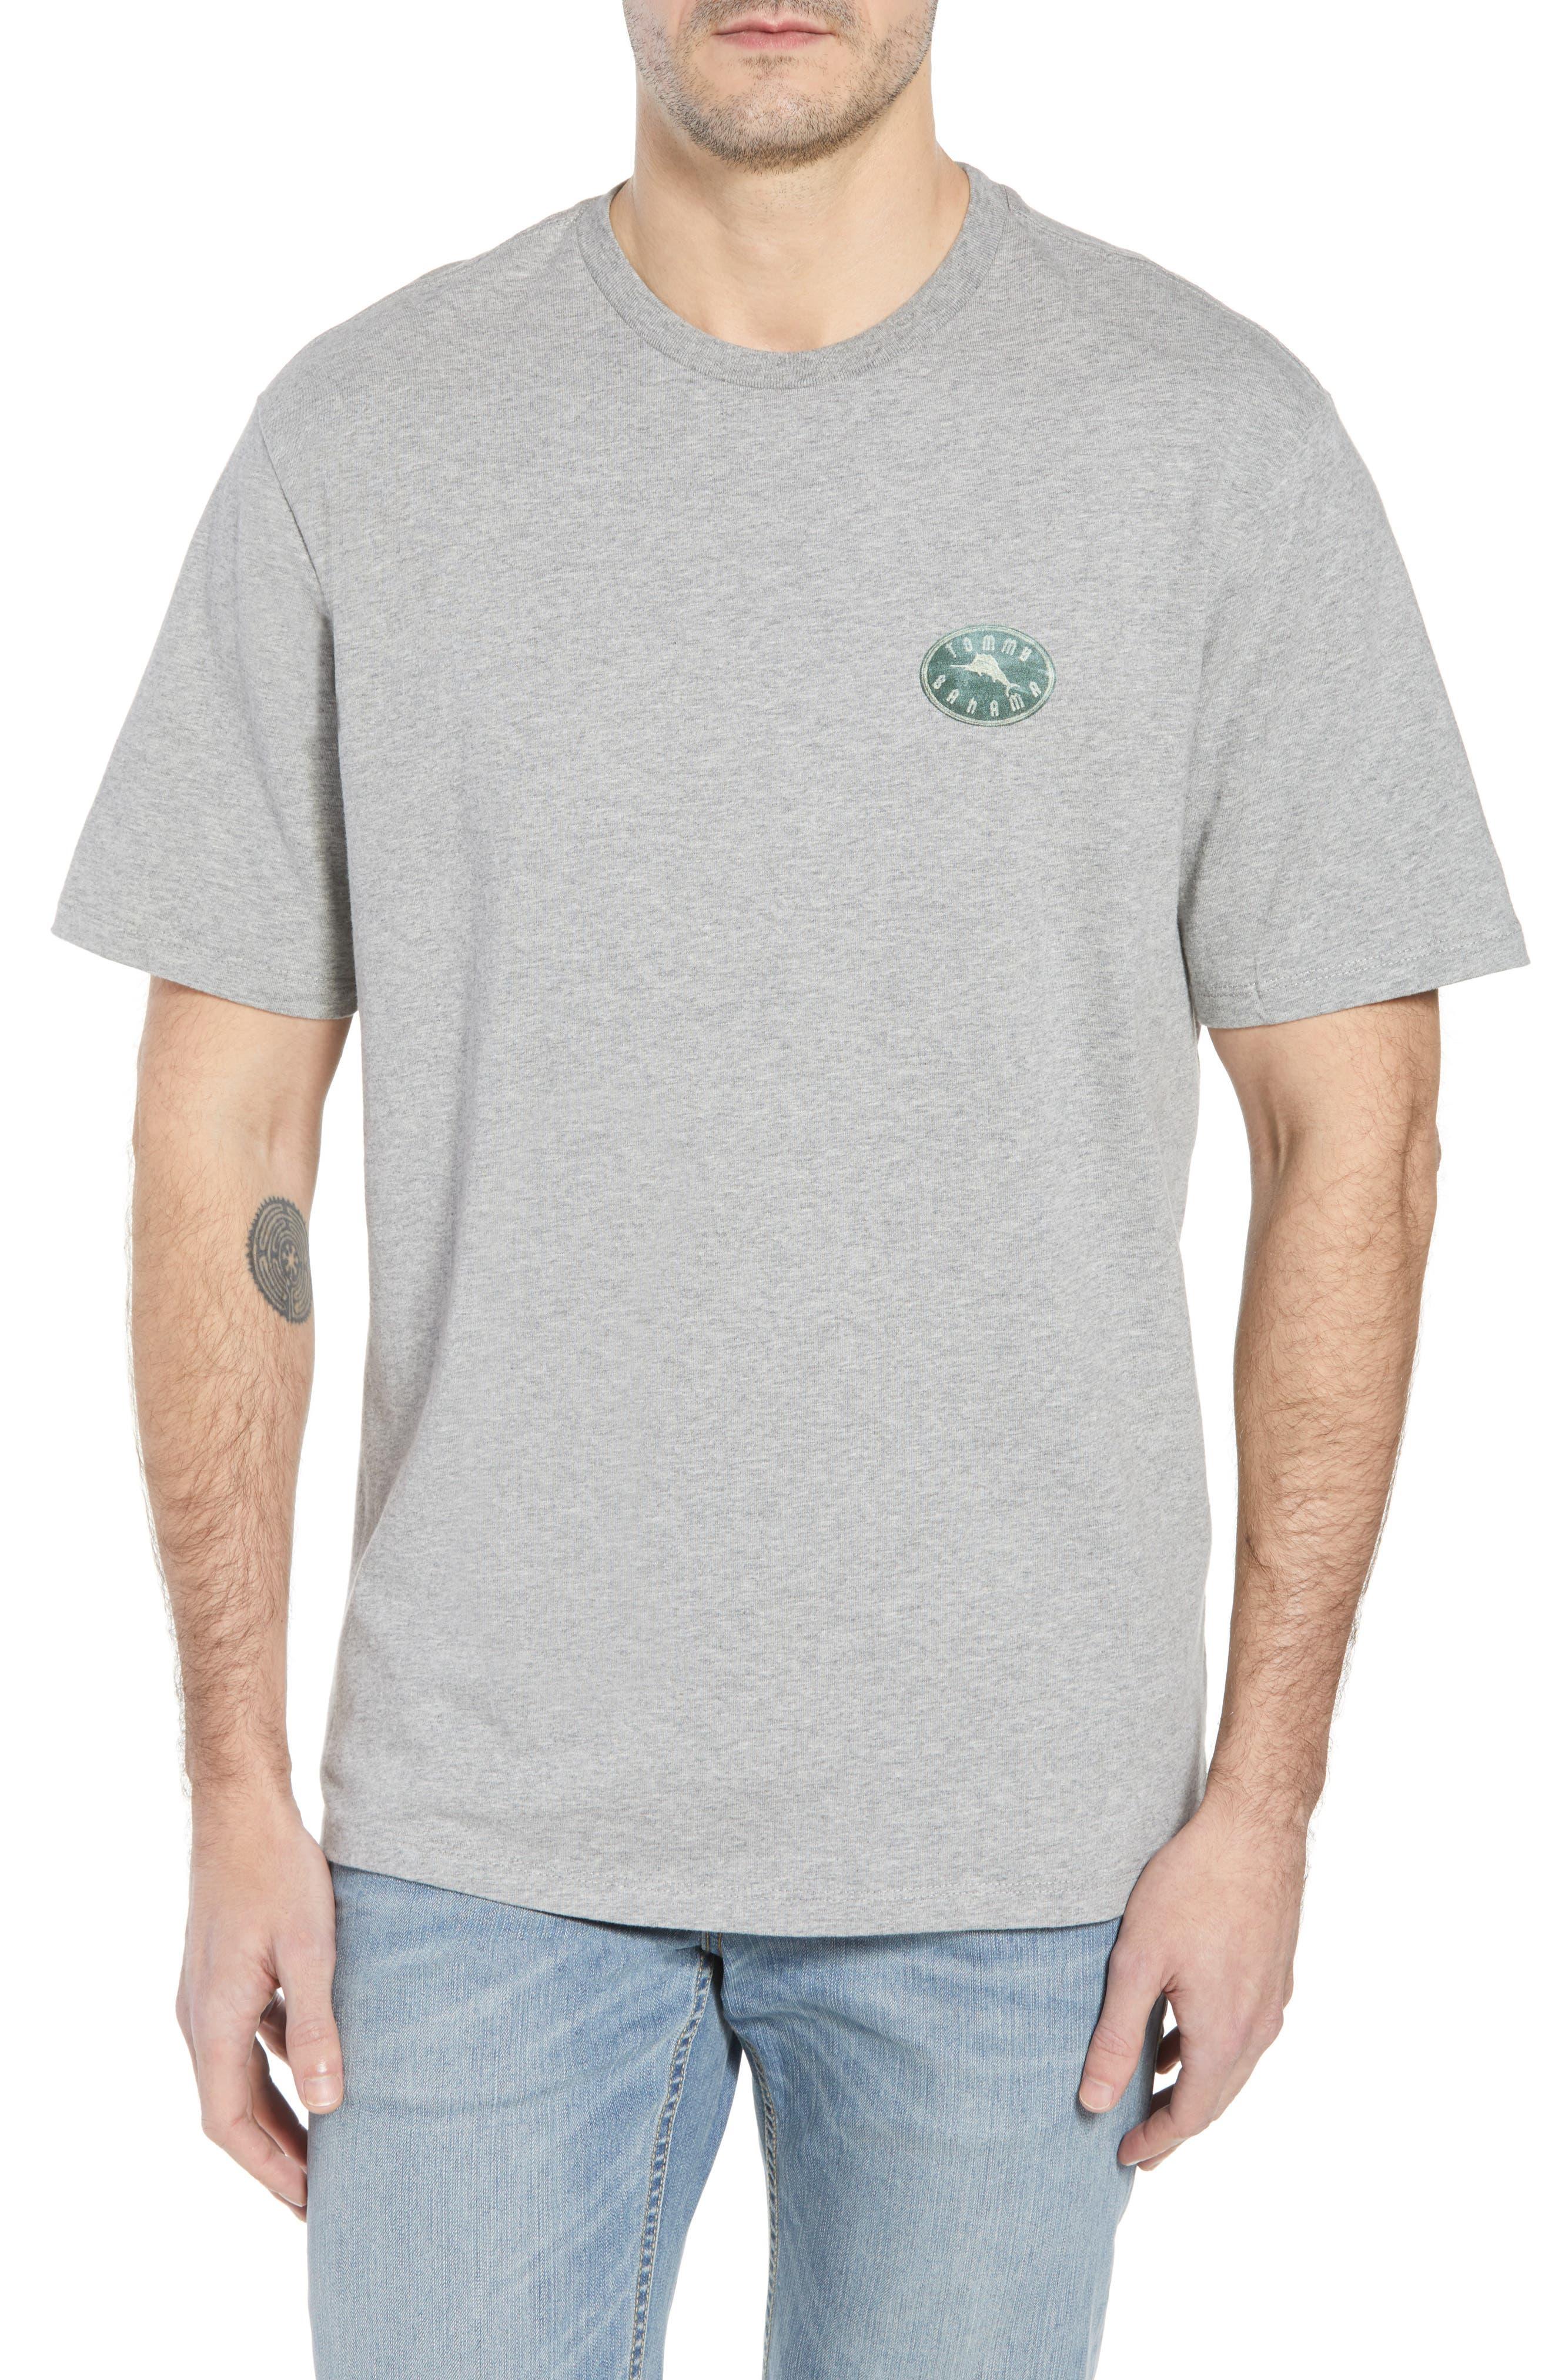 Main Image - Tommy Bahama Chalk & Roll T-Shirt